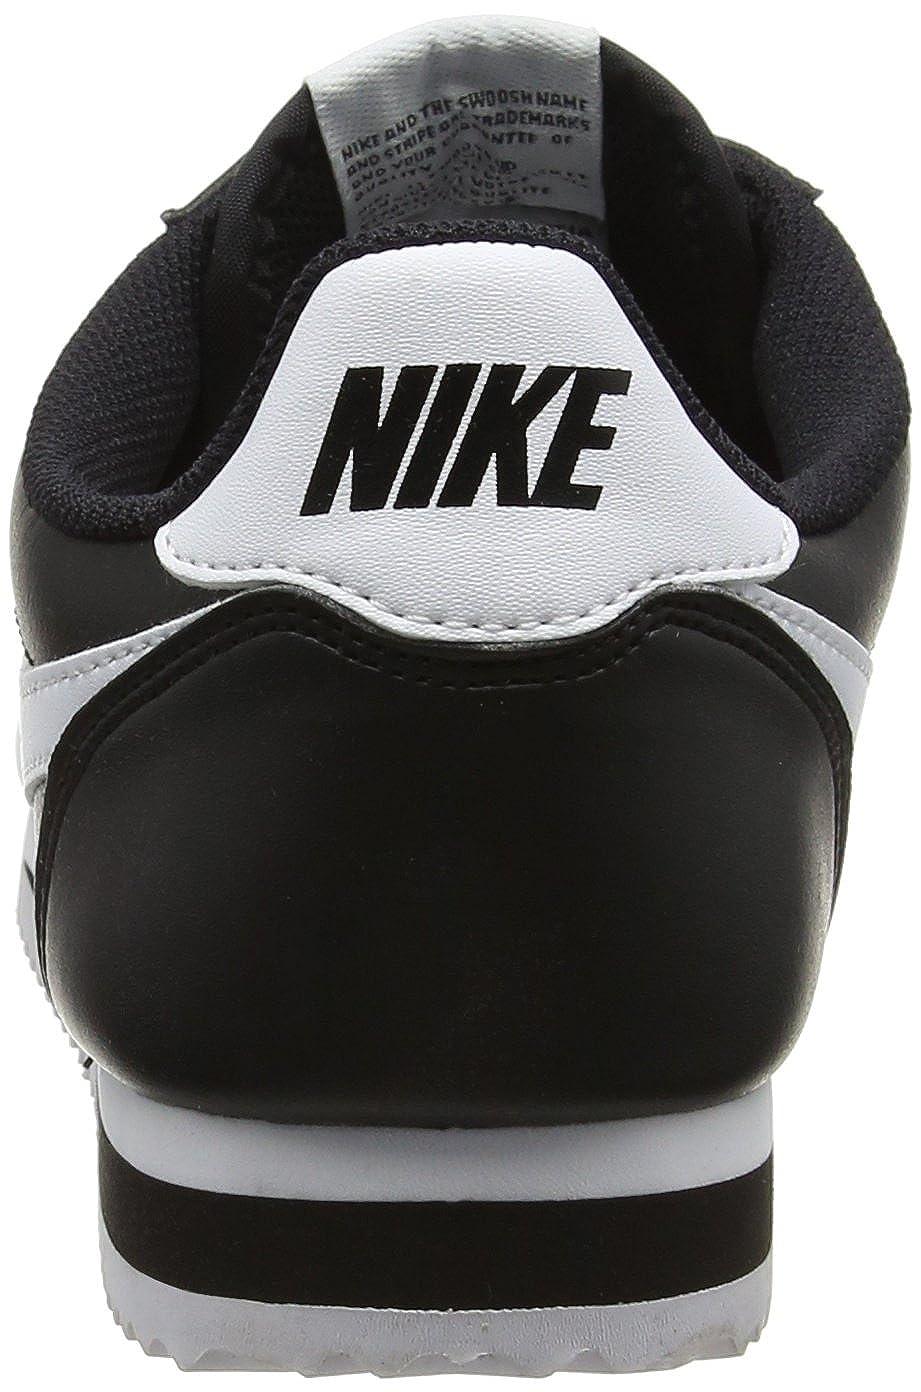 Nike Damen WMNS Classic Cortez Leather Fitnessschuhe Bianco 36.5 EU ... Ruf zuerst